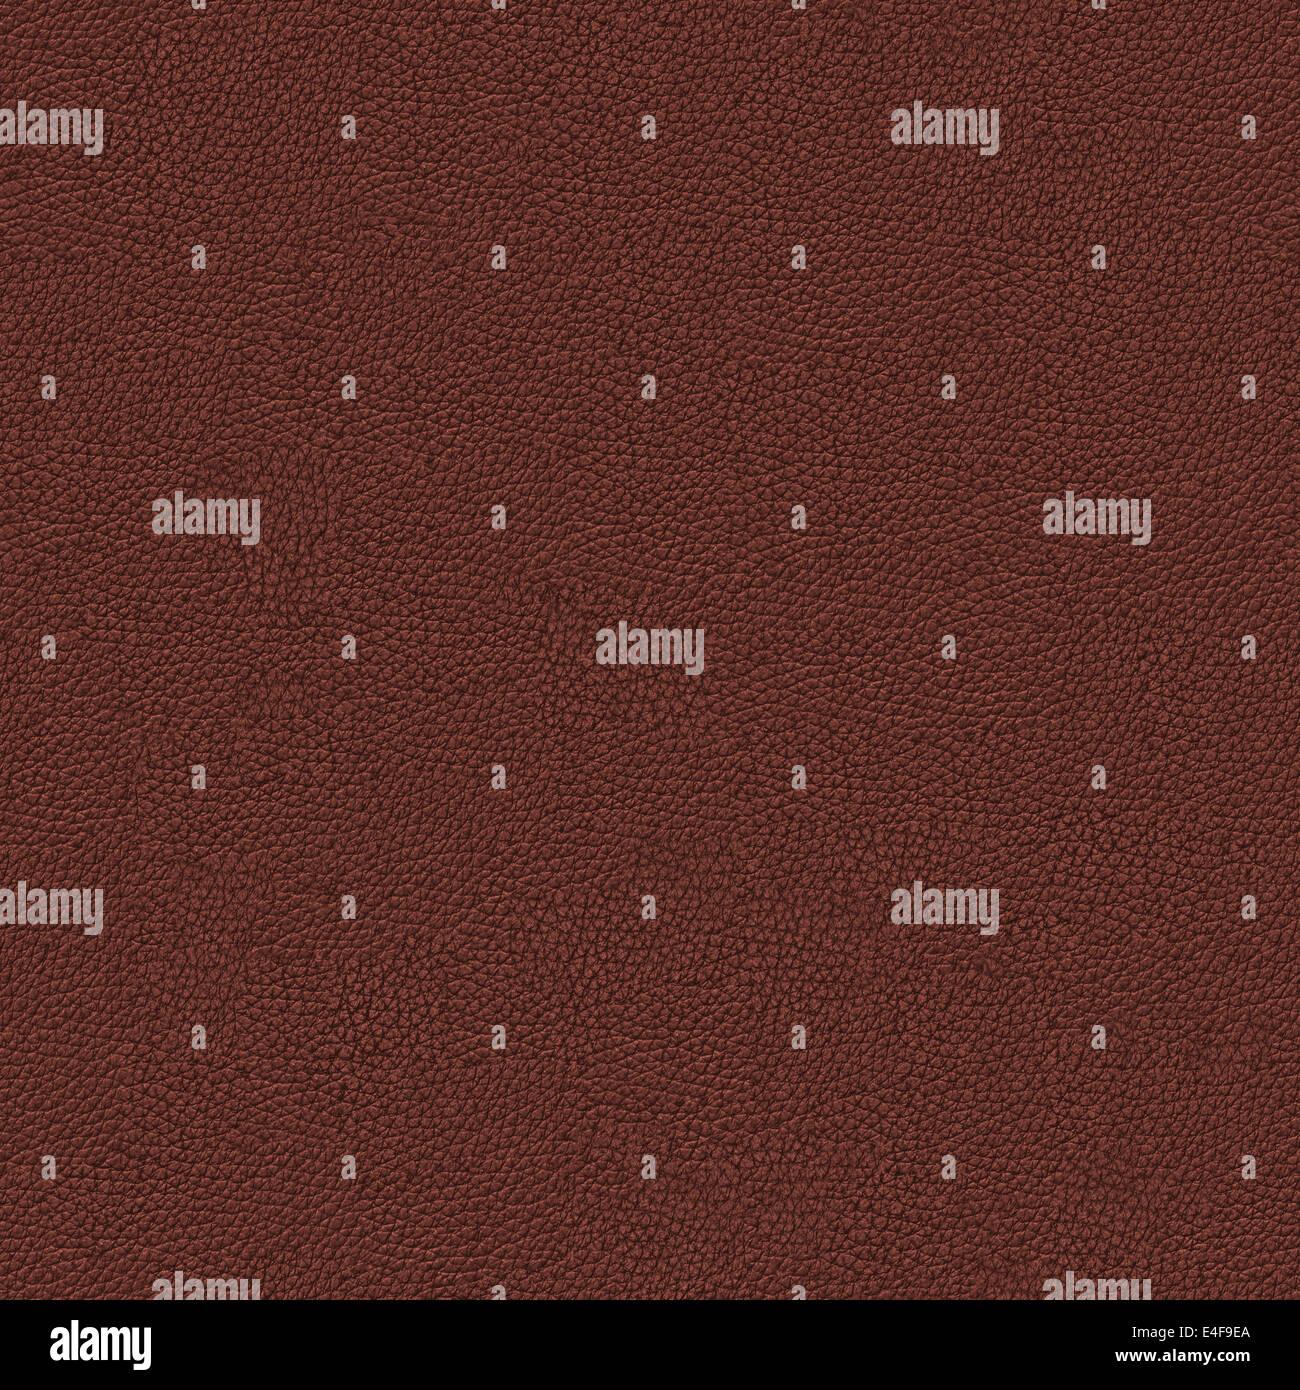 Nahtlos Braun Leder Textur Fliesen Muster Stockfoto Bild 71636834